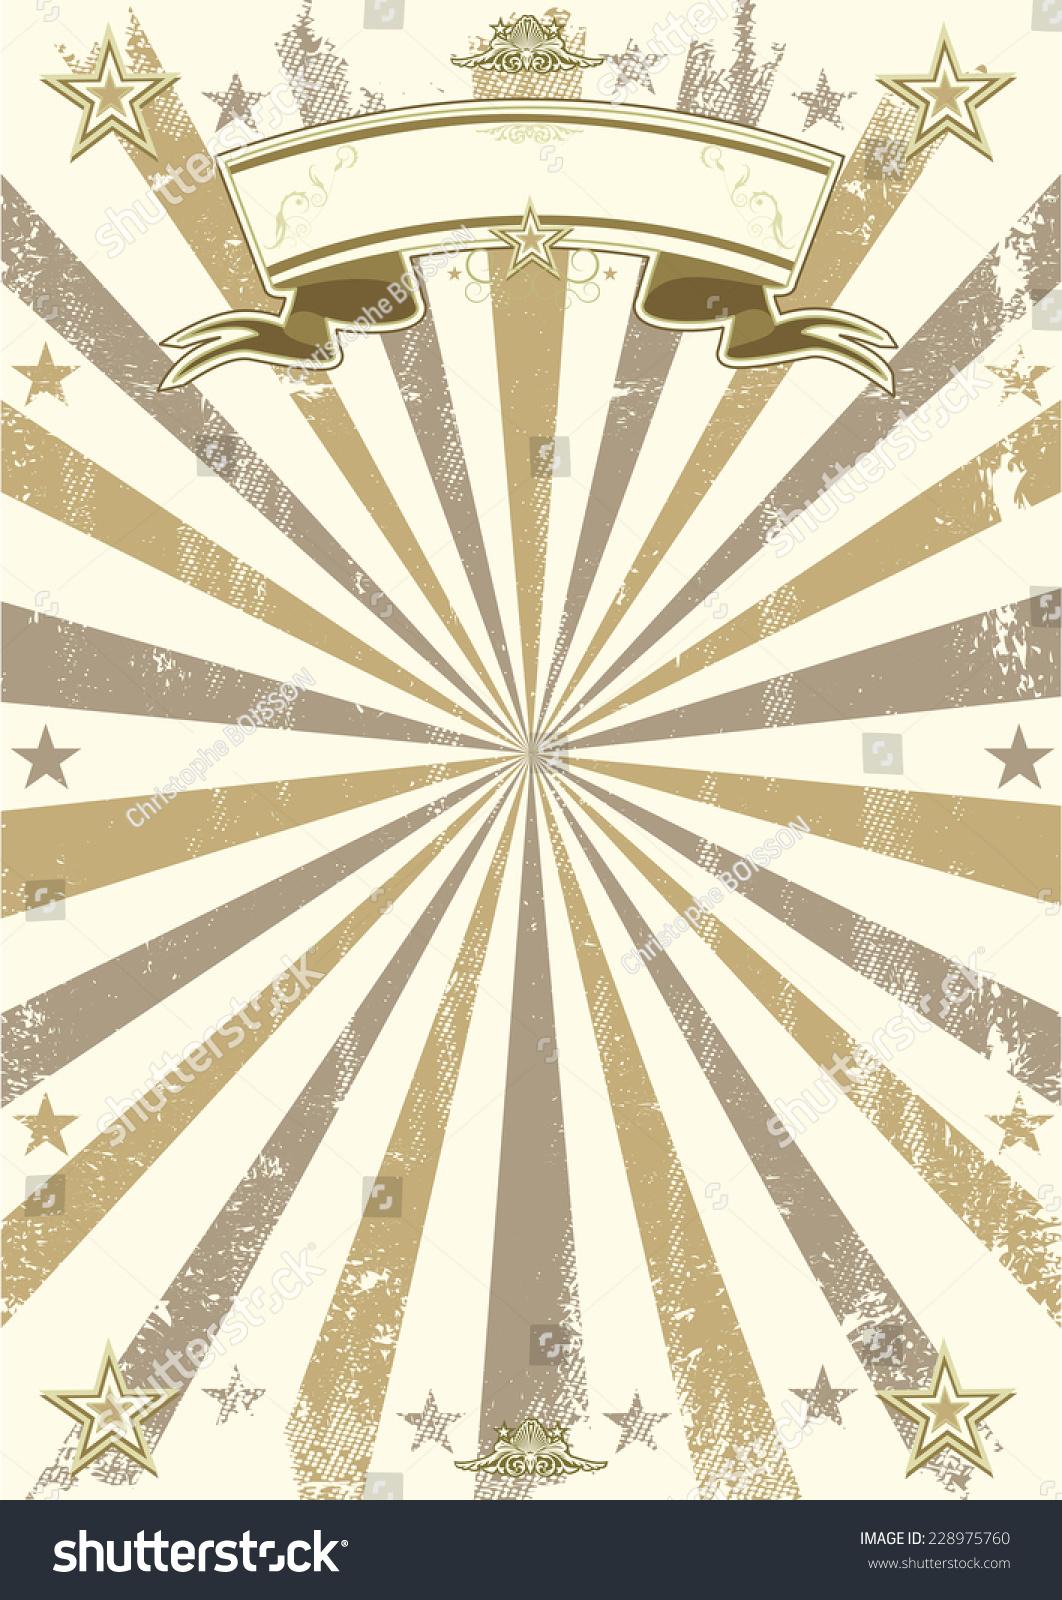 kraft brown vintage paper retro circus stock vector (royalty free